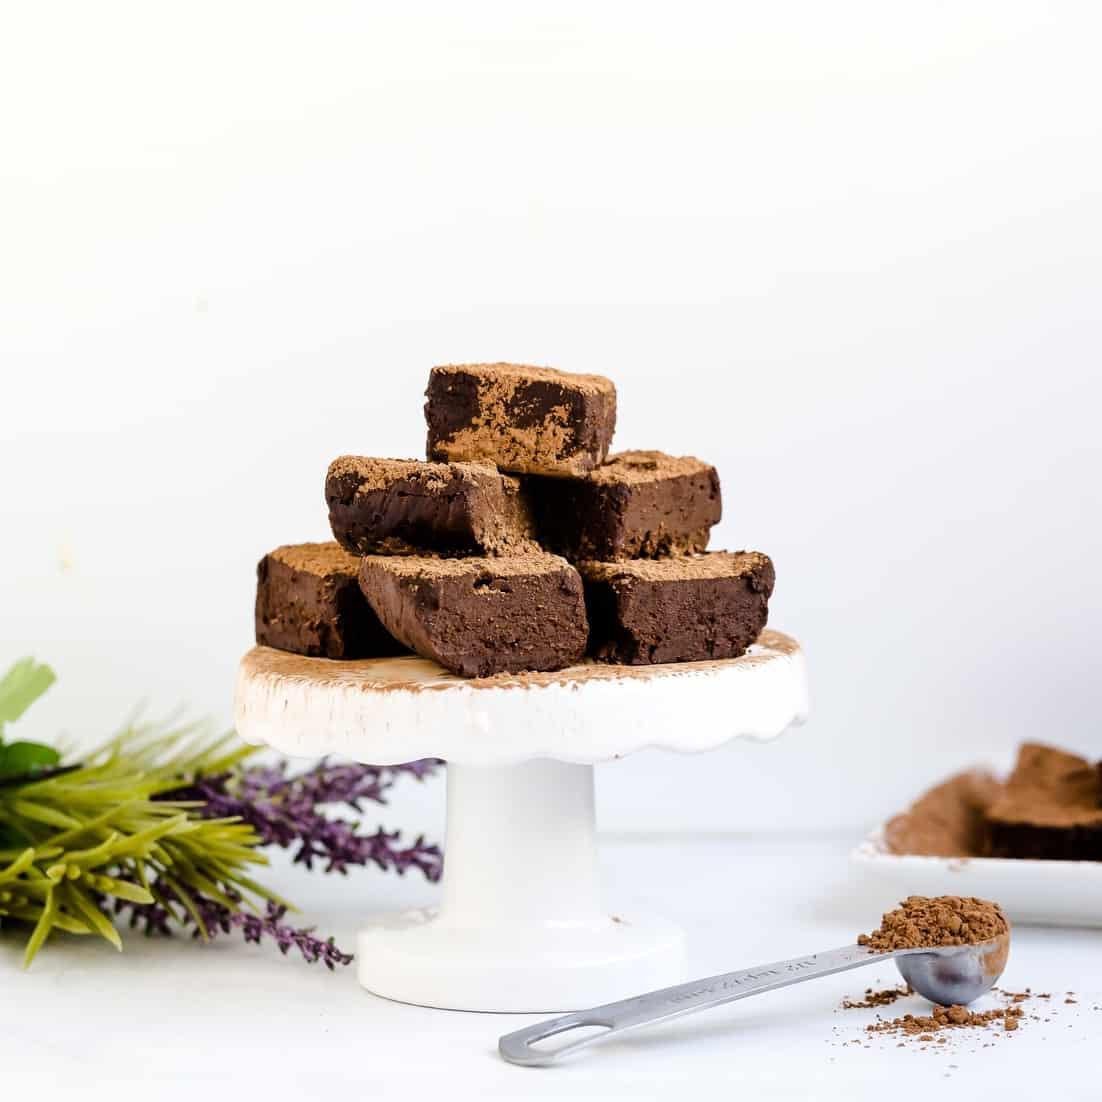 Easy Keto Chocolate Truffles LowCarbingAsian Pic 2